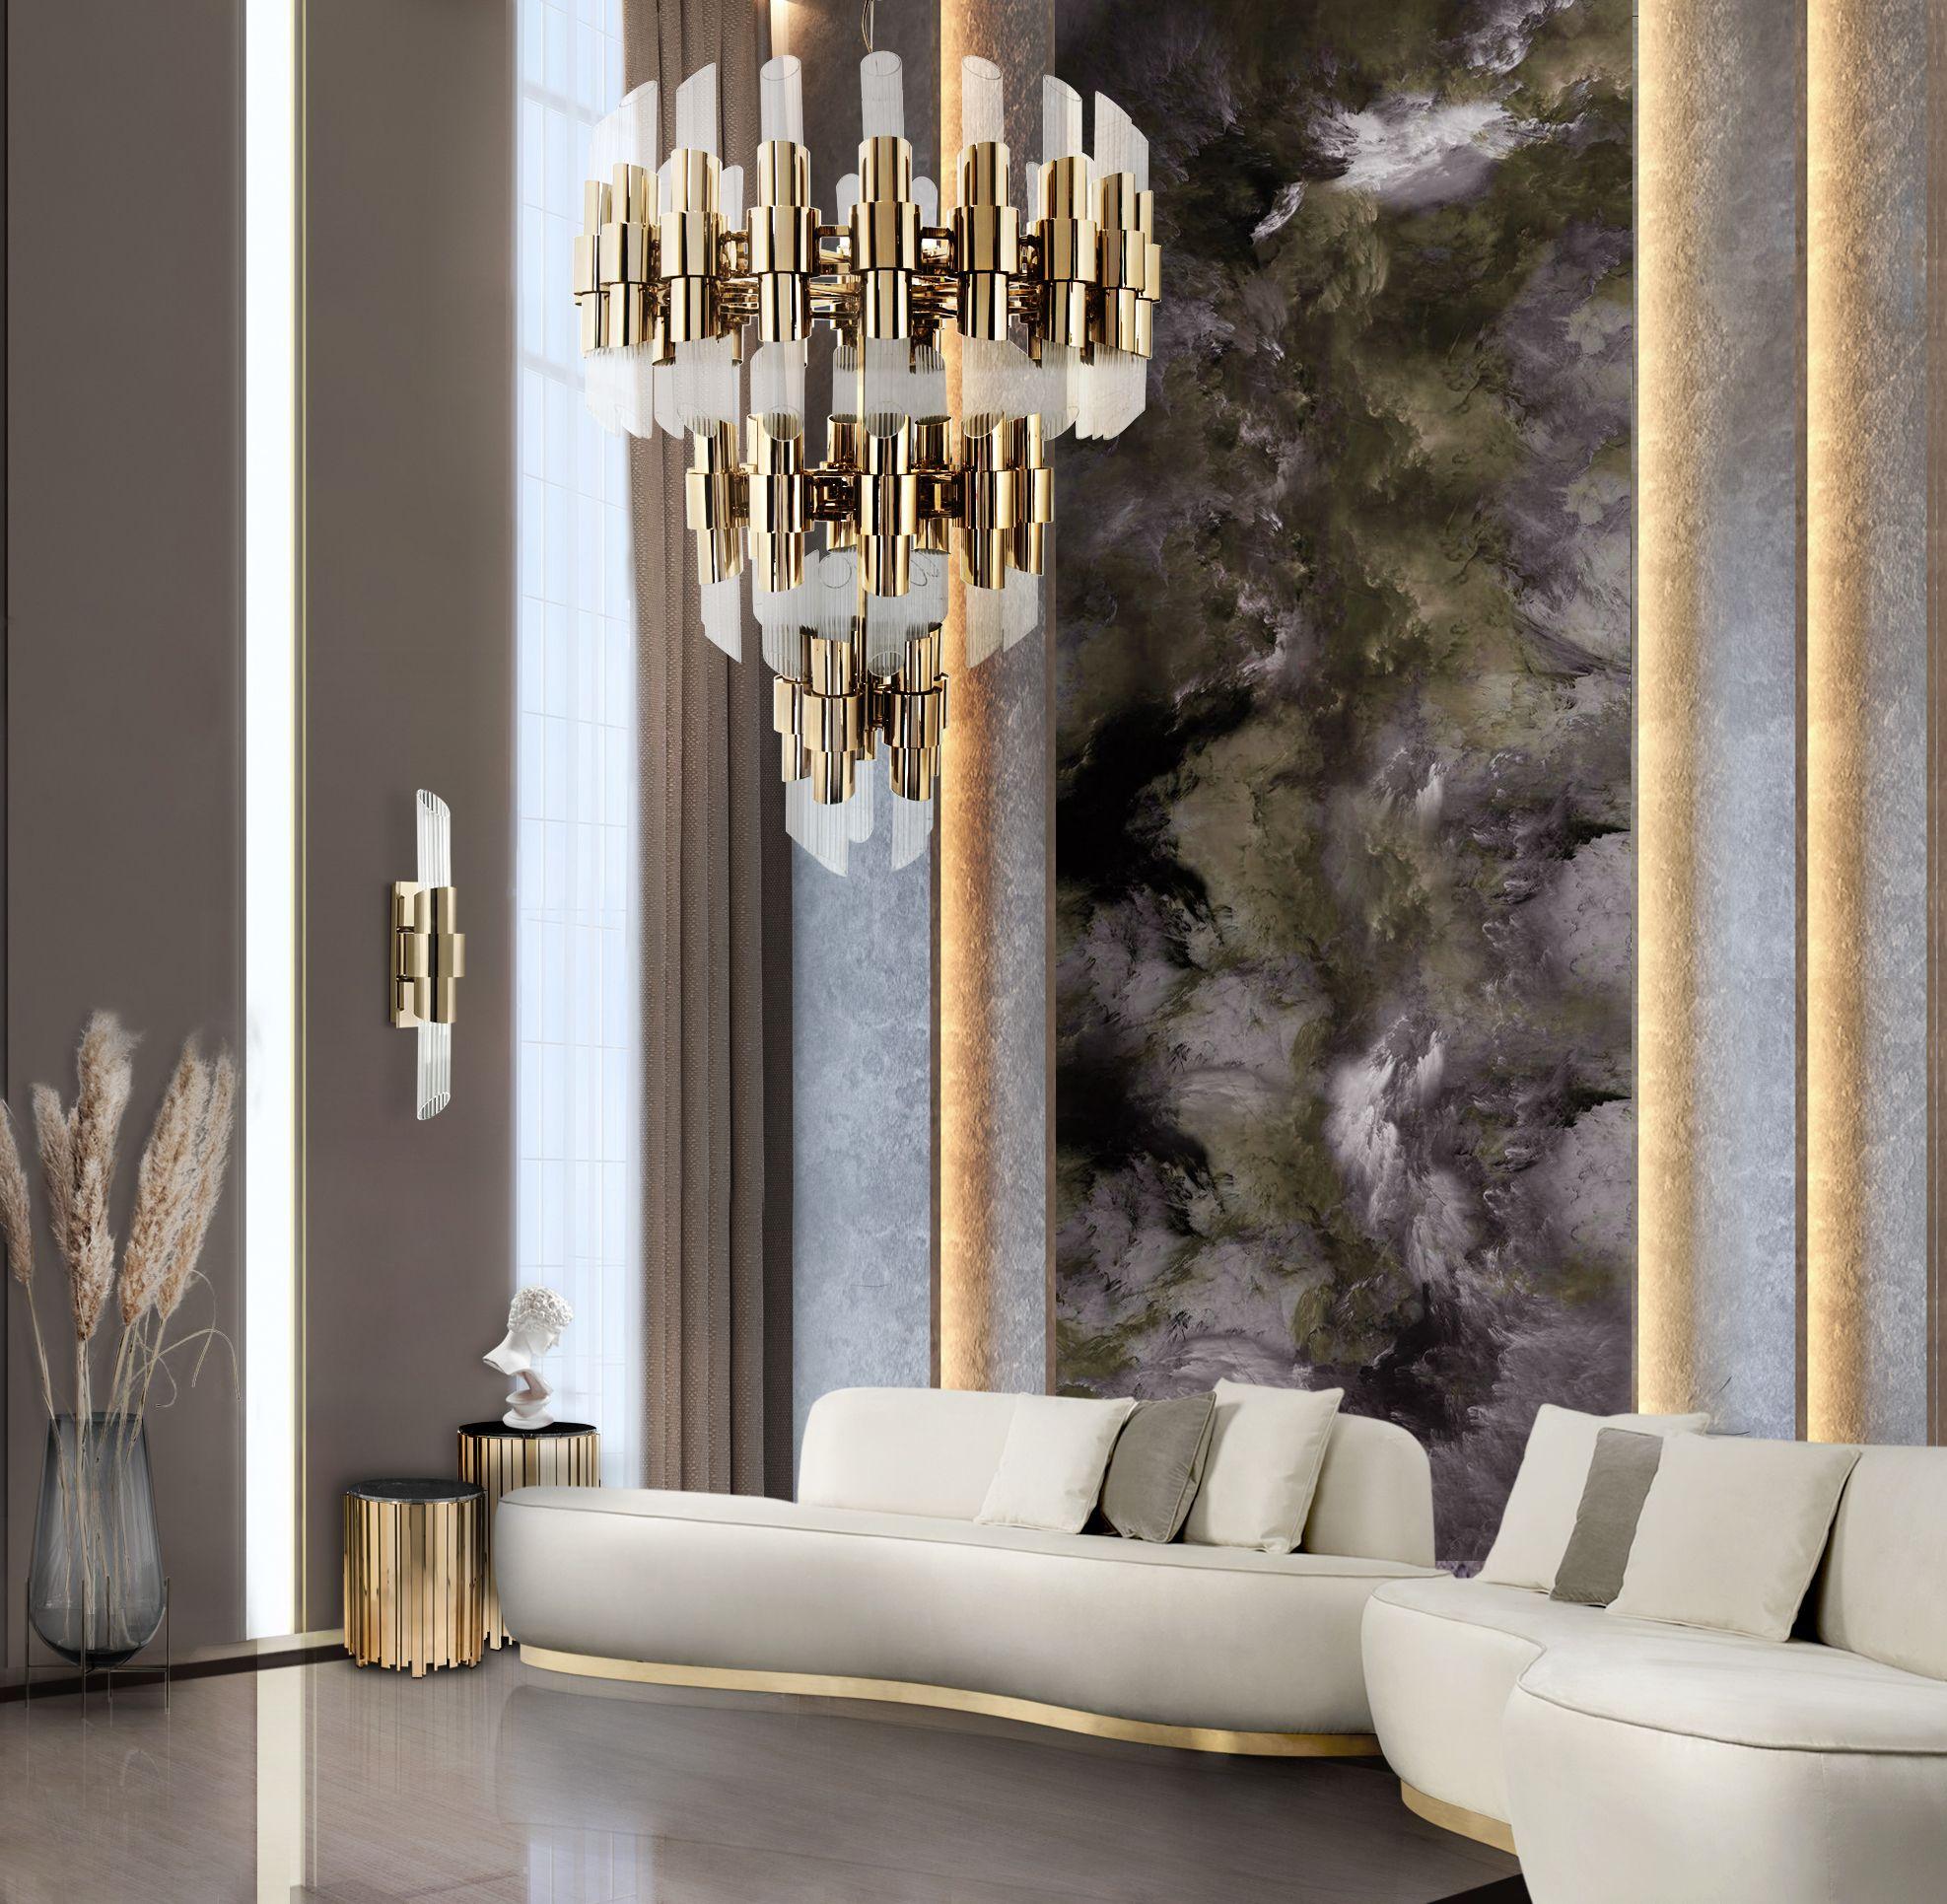 Luxury Living Room Decor Luxury Living Room Decor Luxury Living Room Living Room Designs #trending #living #room #decor